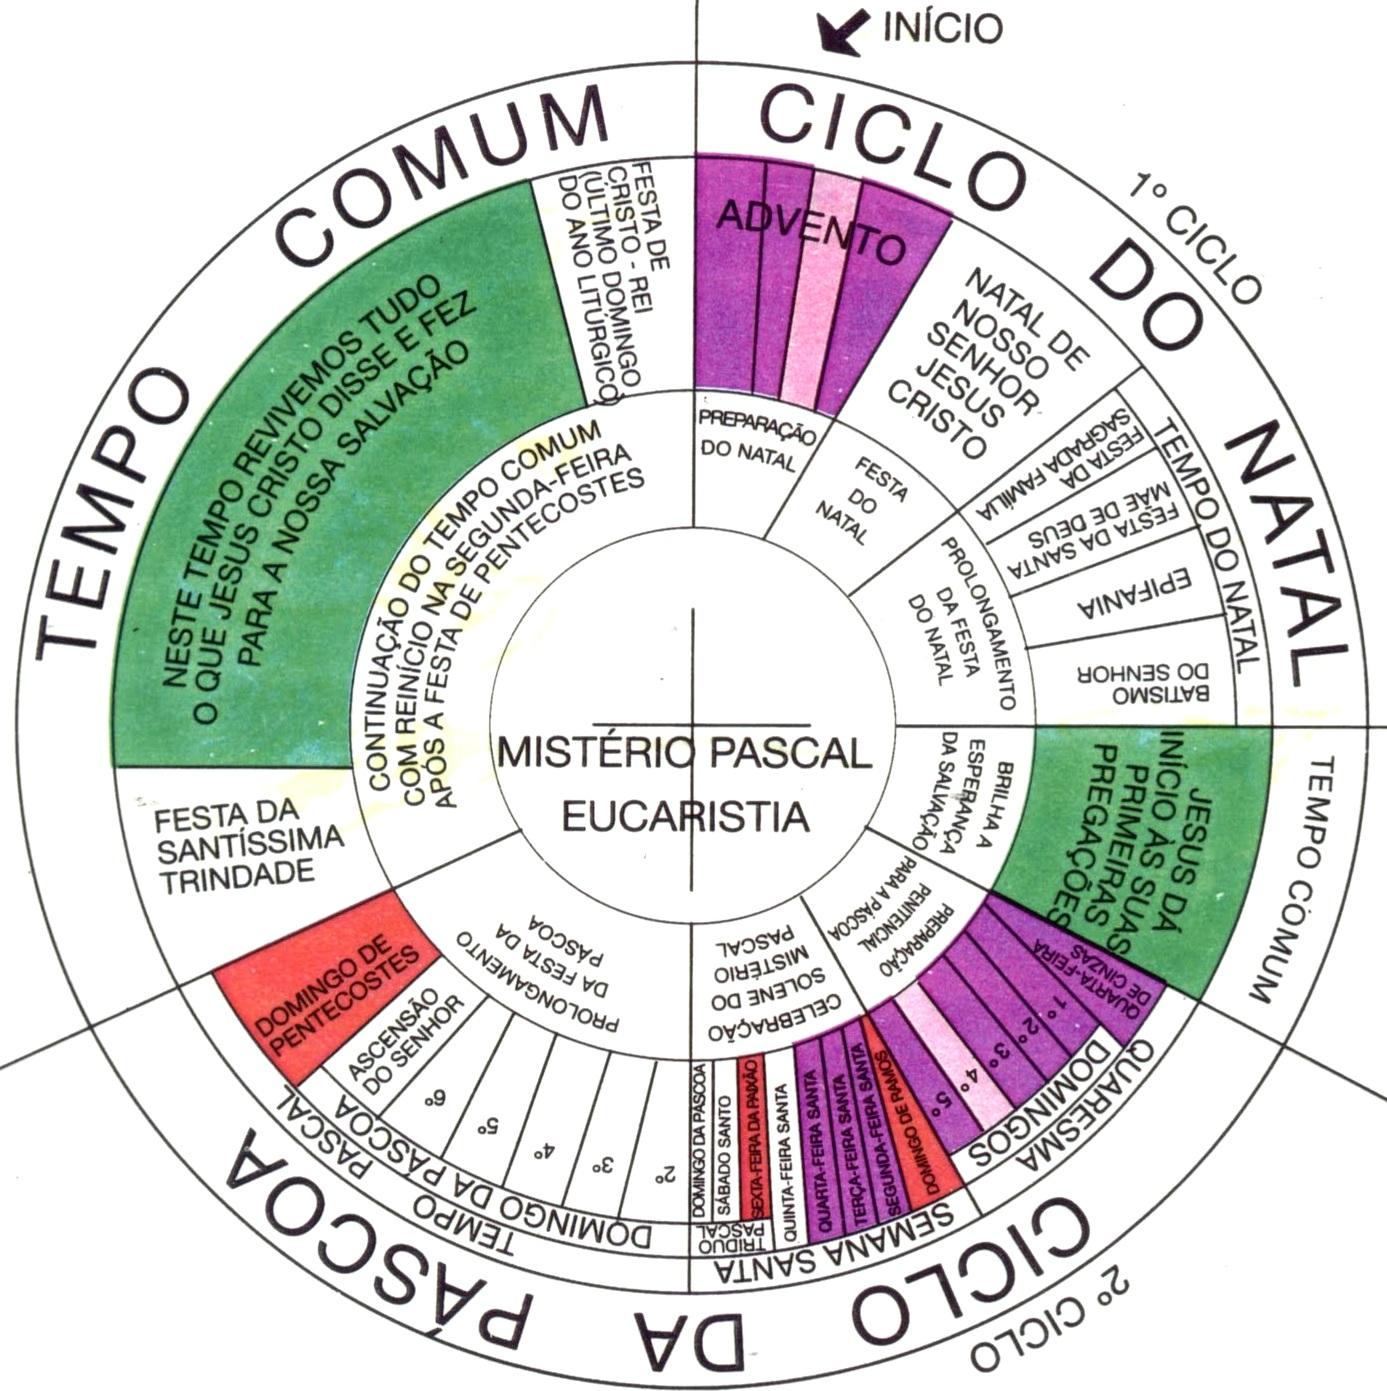 Calendario liturgico catolico search results calendar 2015 for Ciudad redonda calendario